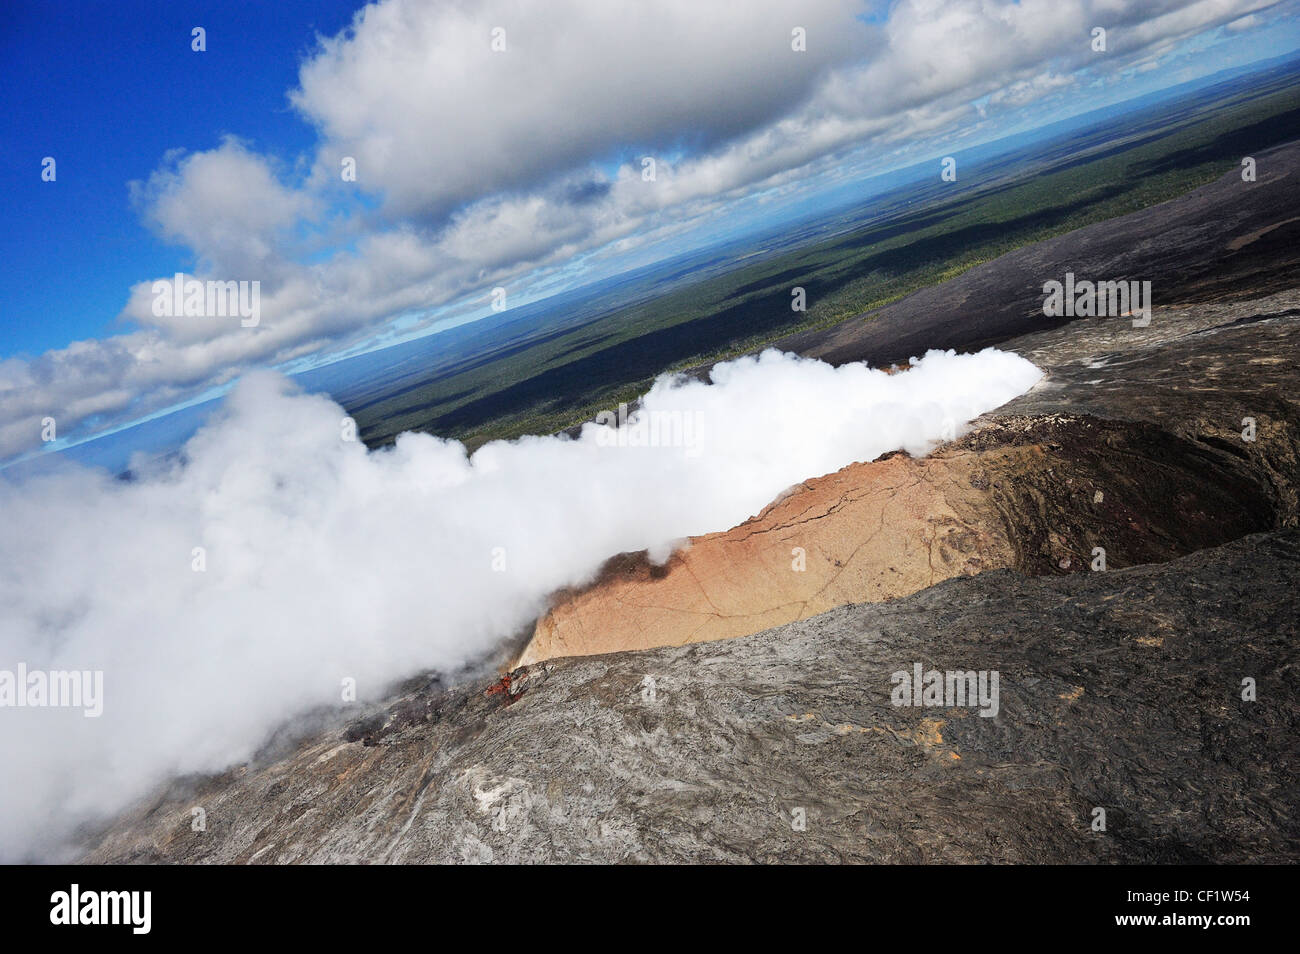 Volcano - Pu'u O'o or Puu Oo crater - aerial view - Kilauea, Hawaii - Stock Image